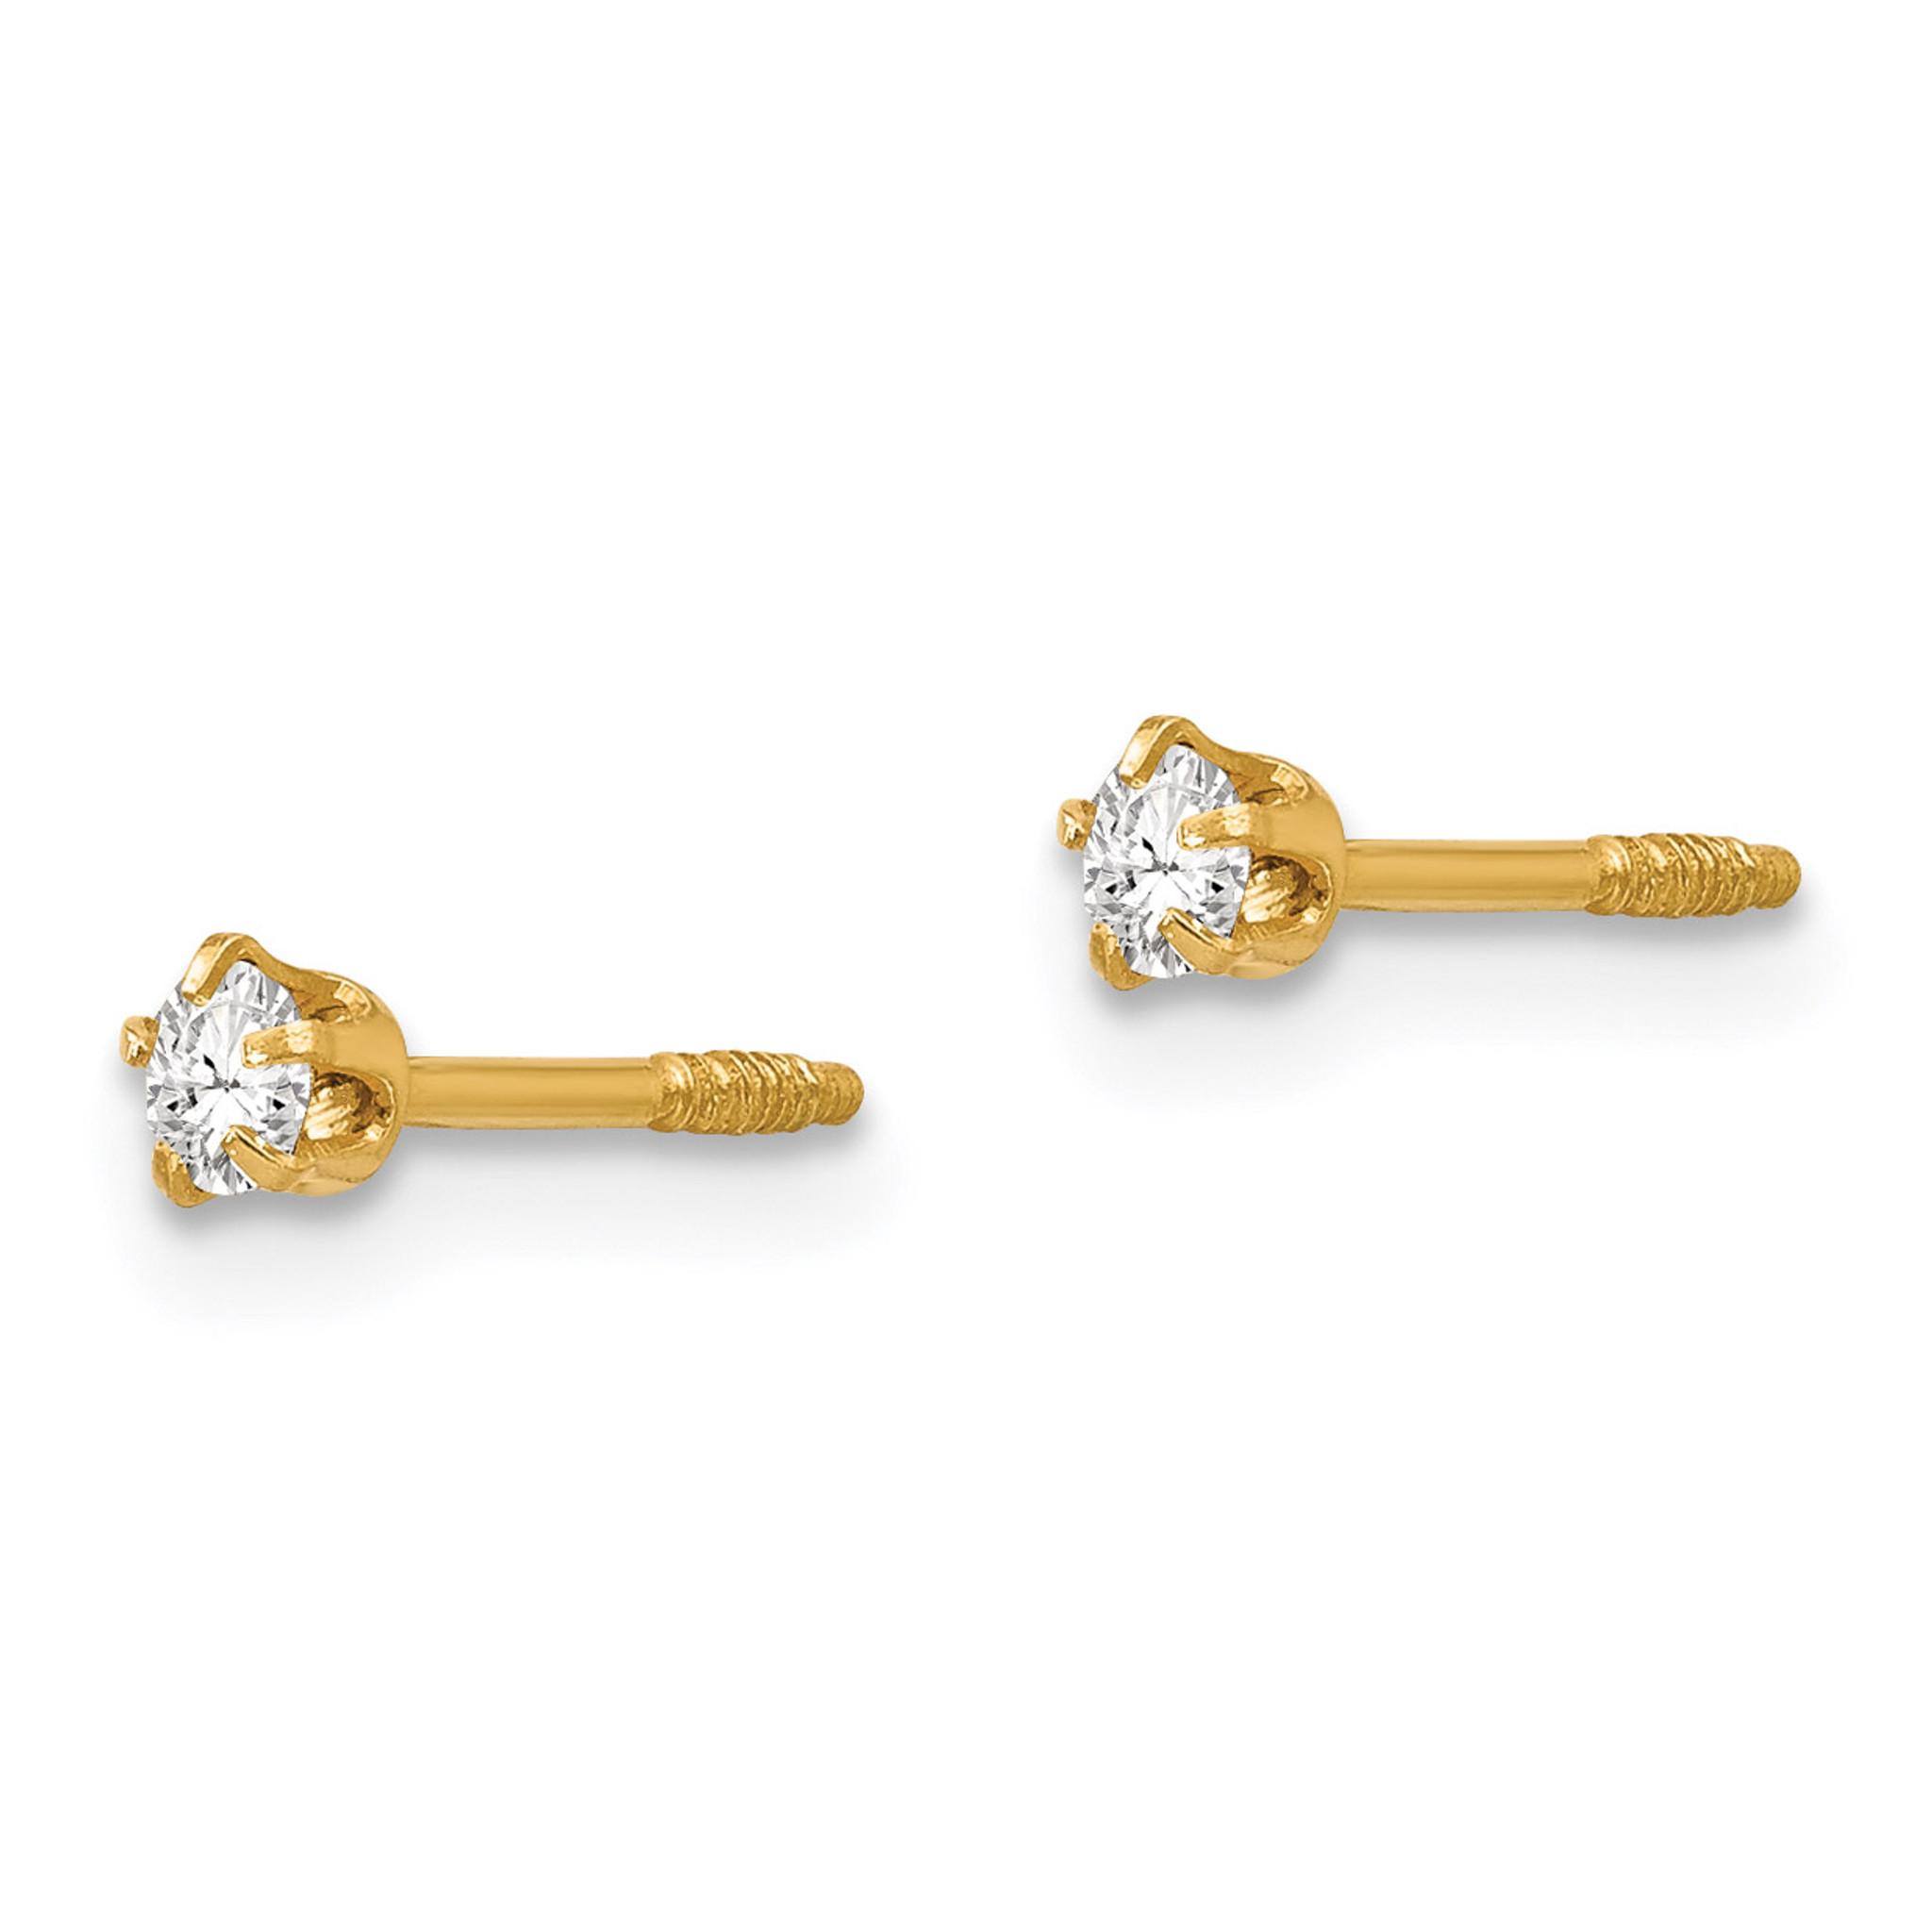 14K Yellow Gold Madi K Polished Reversible Crystal 3mm Ball Earrings 3 mm 3 mm Ball Earrings Jewelry